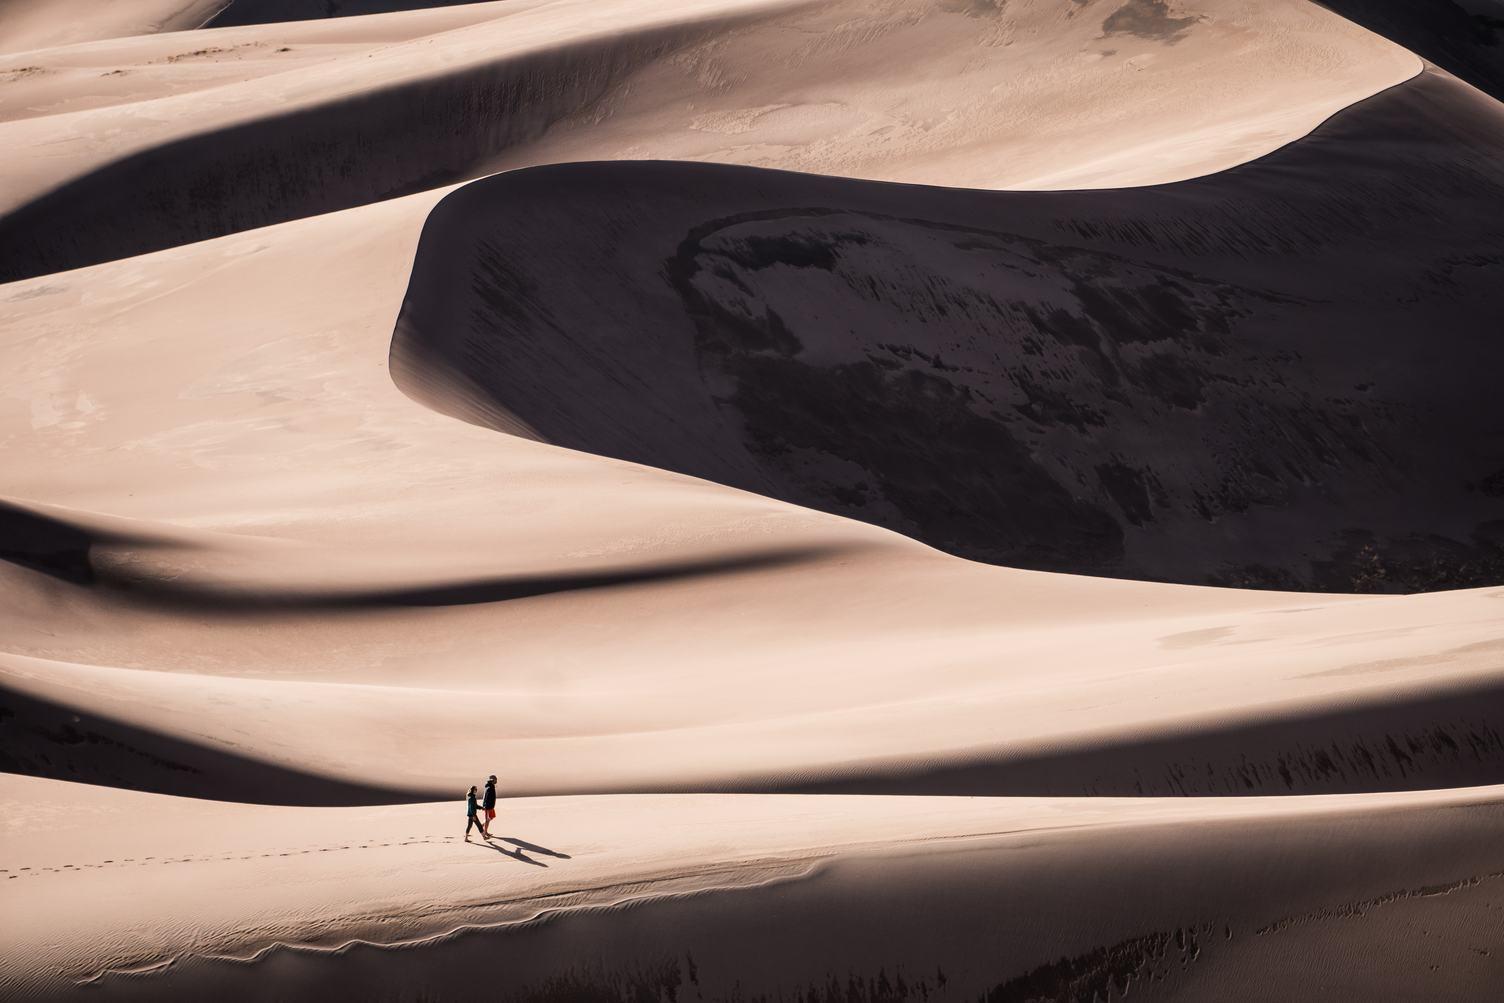 Couple Walking Through the Sand Dunes